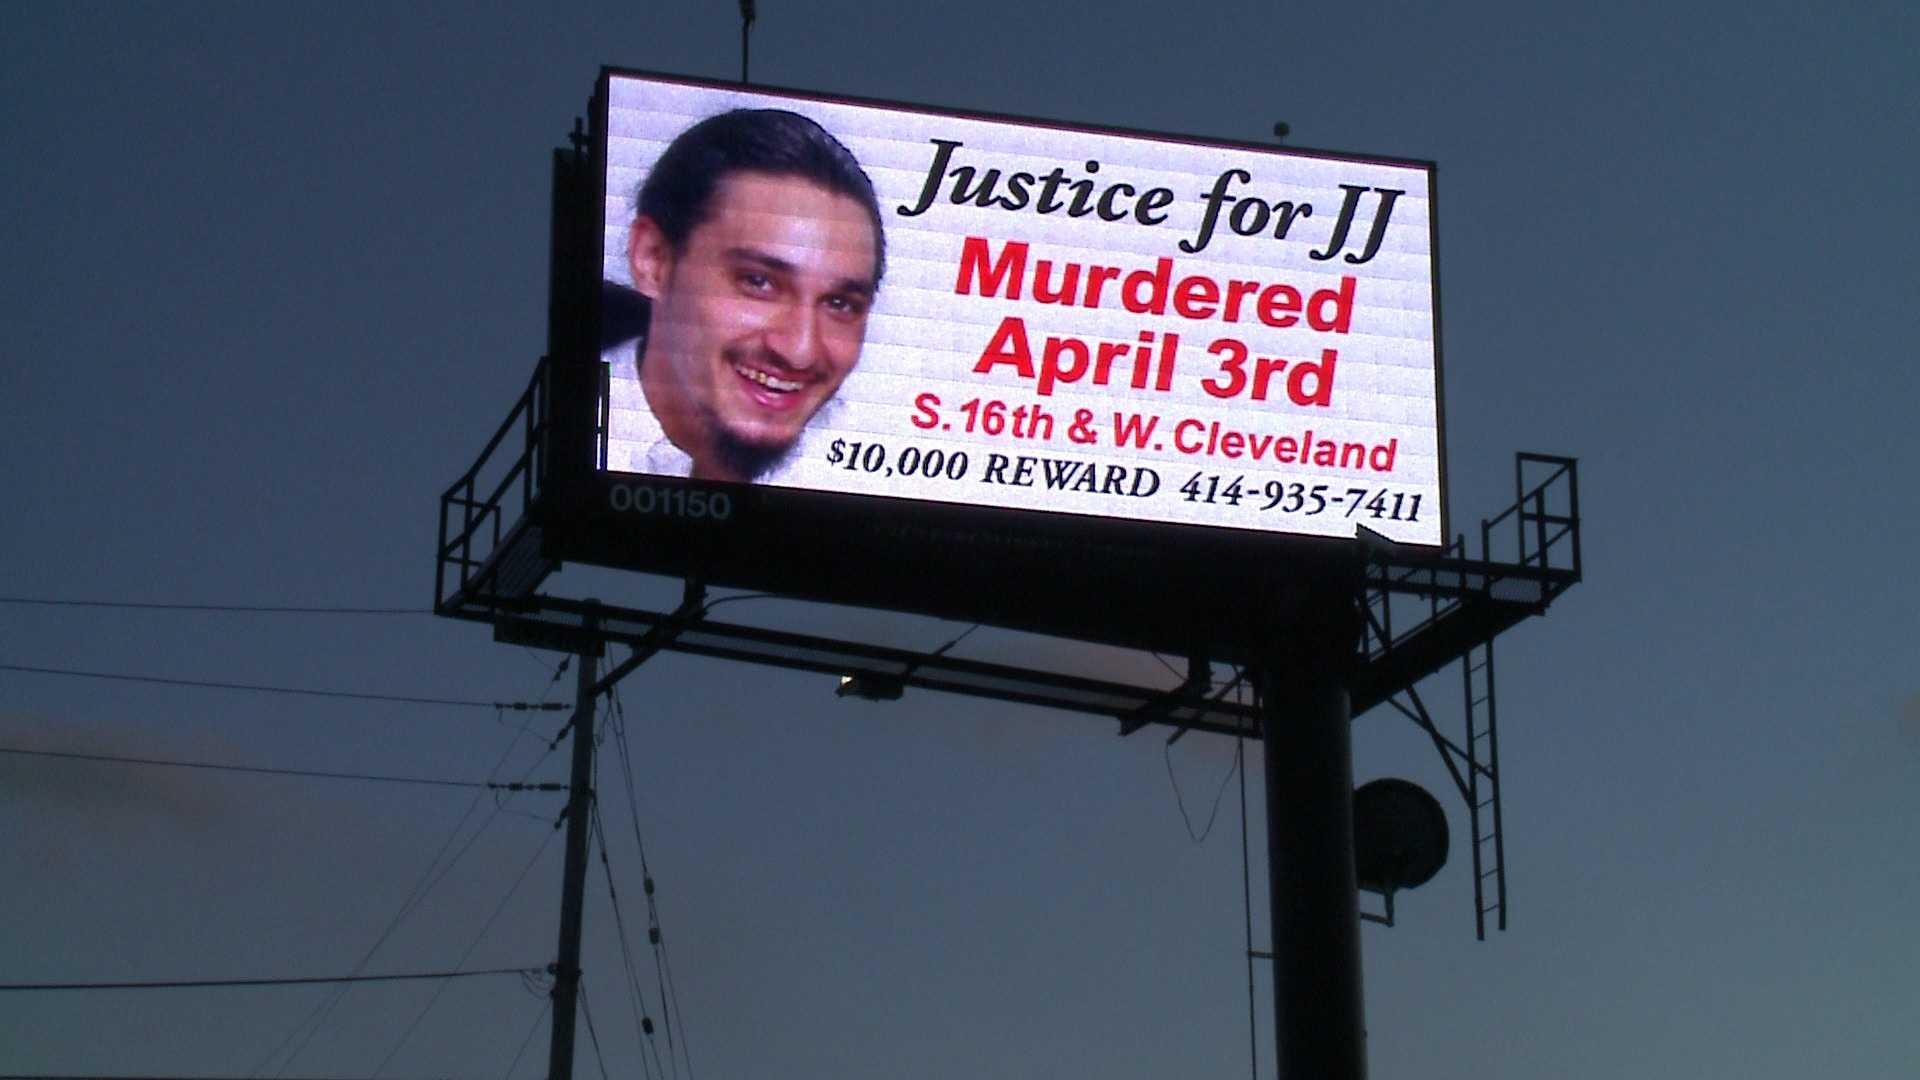 Billboard seeks information in murder of Justin Kohen, J.J., of Milwaukee.